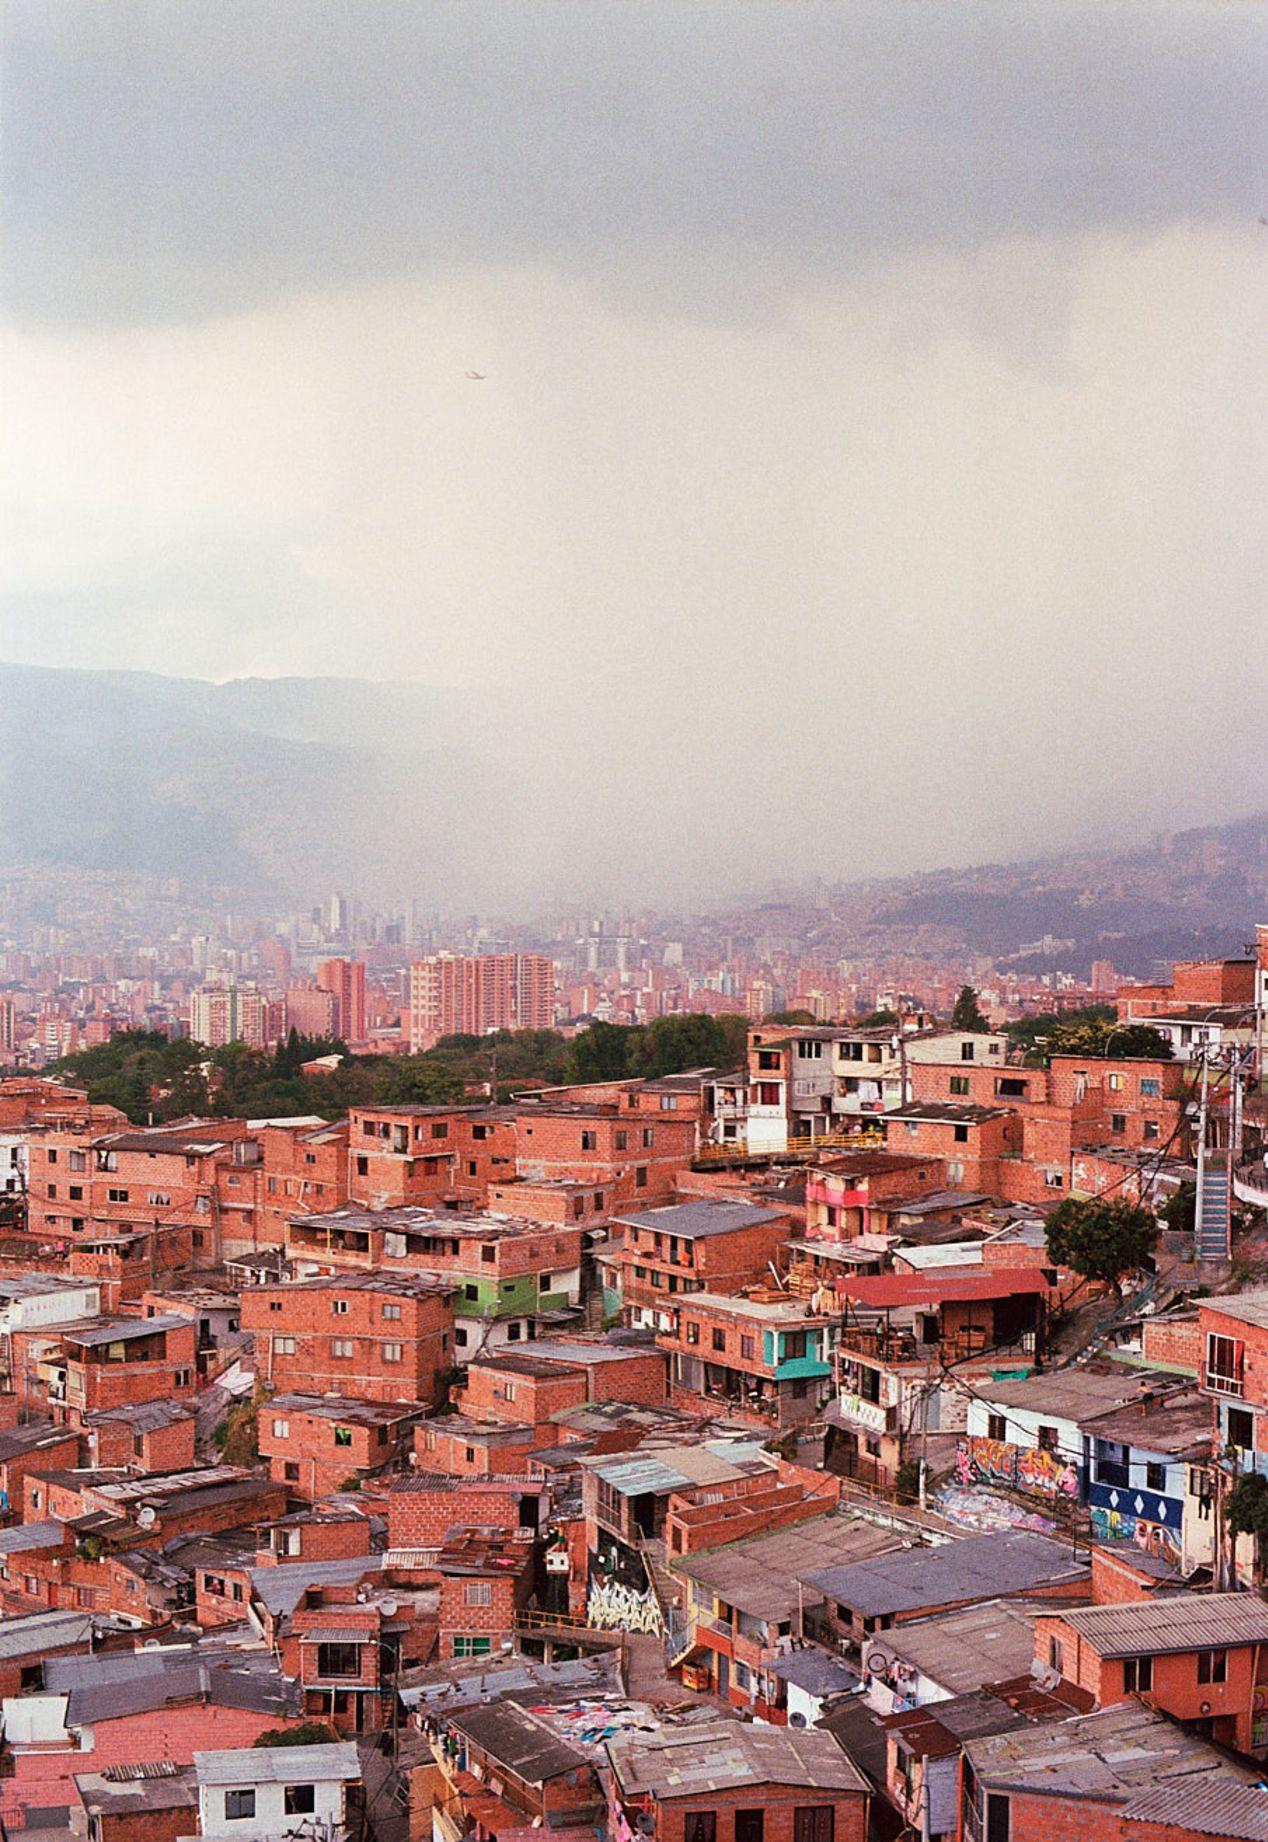 Downtown Medellín engulfed in heavy rain clouds. Shot on Kodak Ektar 100 with Minolta XD-7 and MD Rokkor 50mm f/1.4.